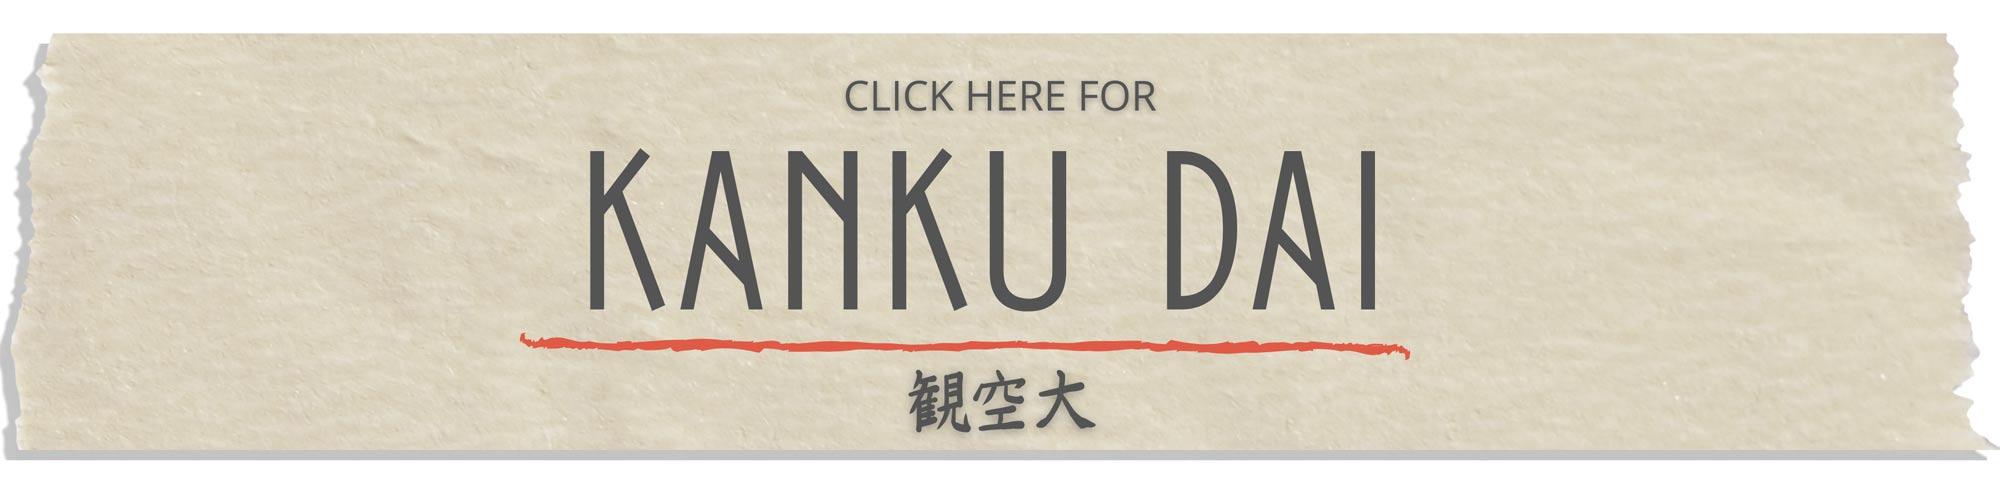 kanku dai